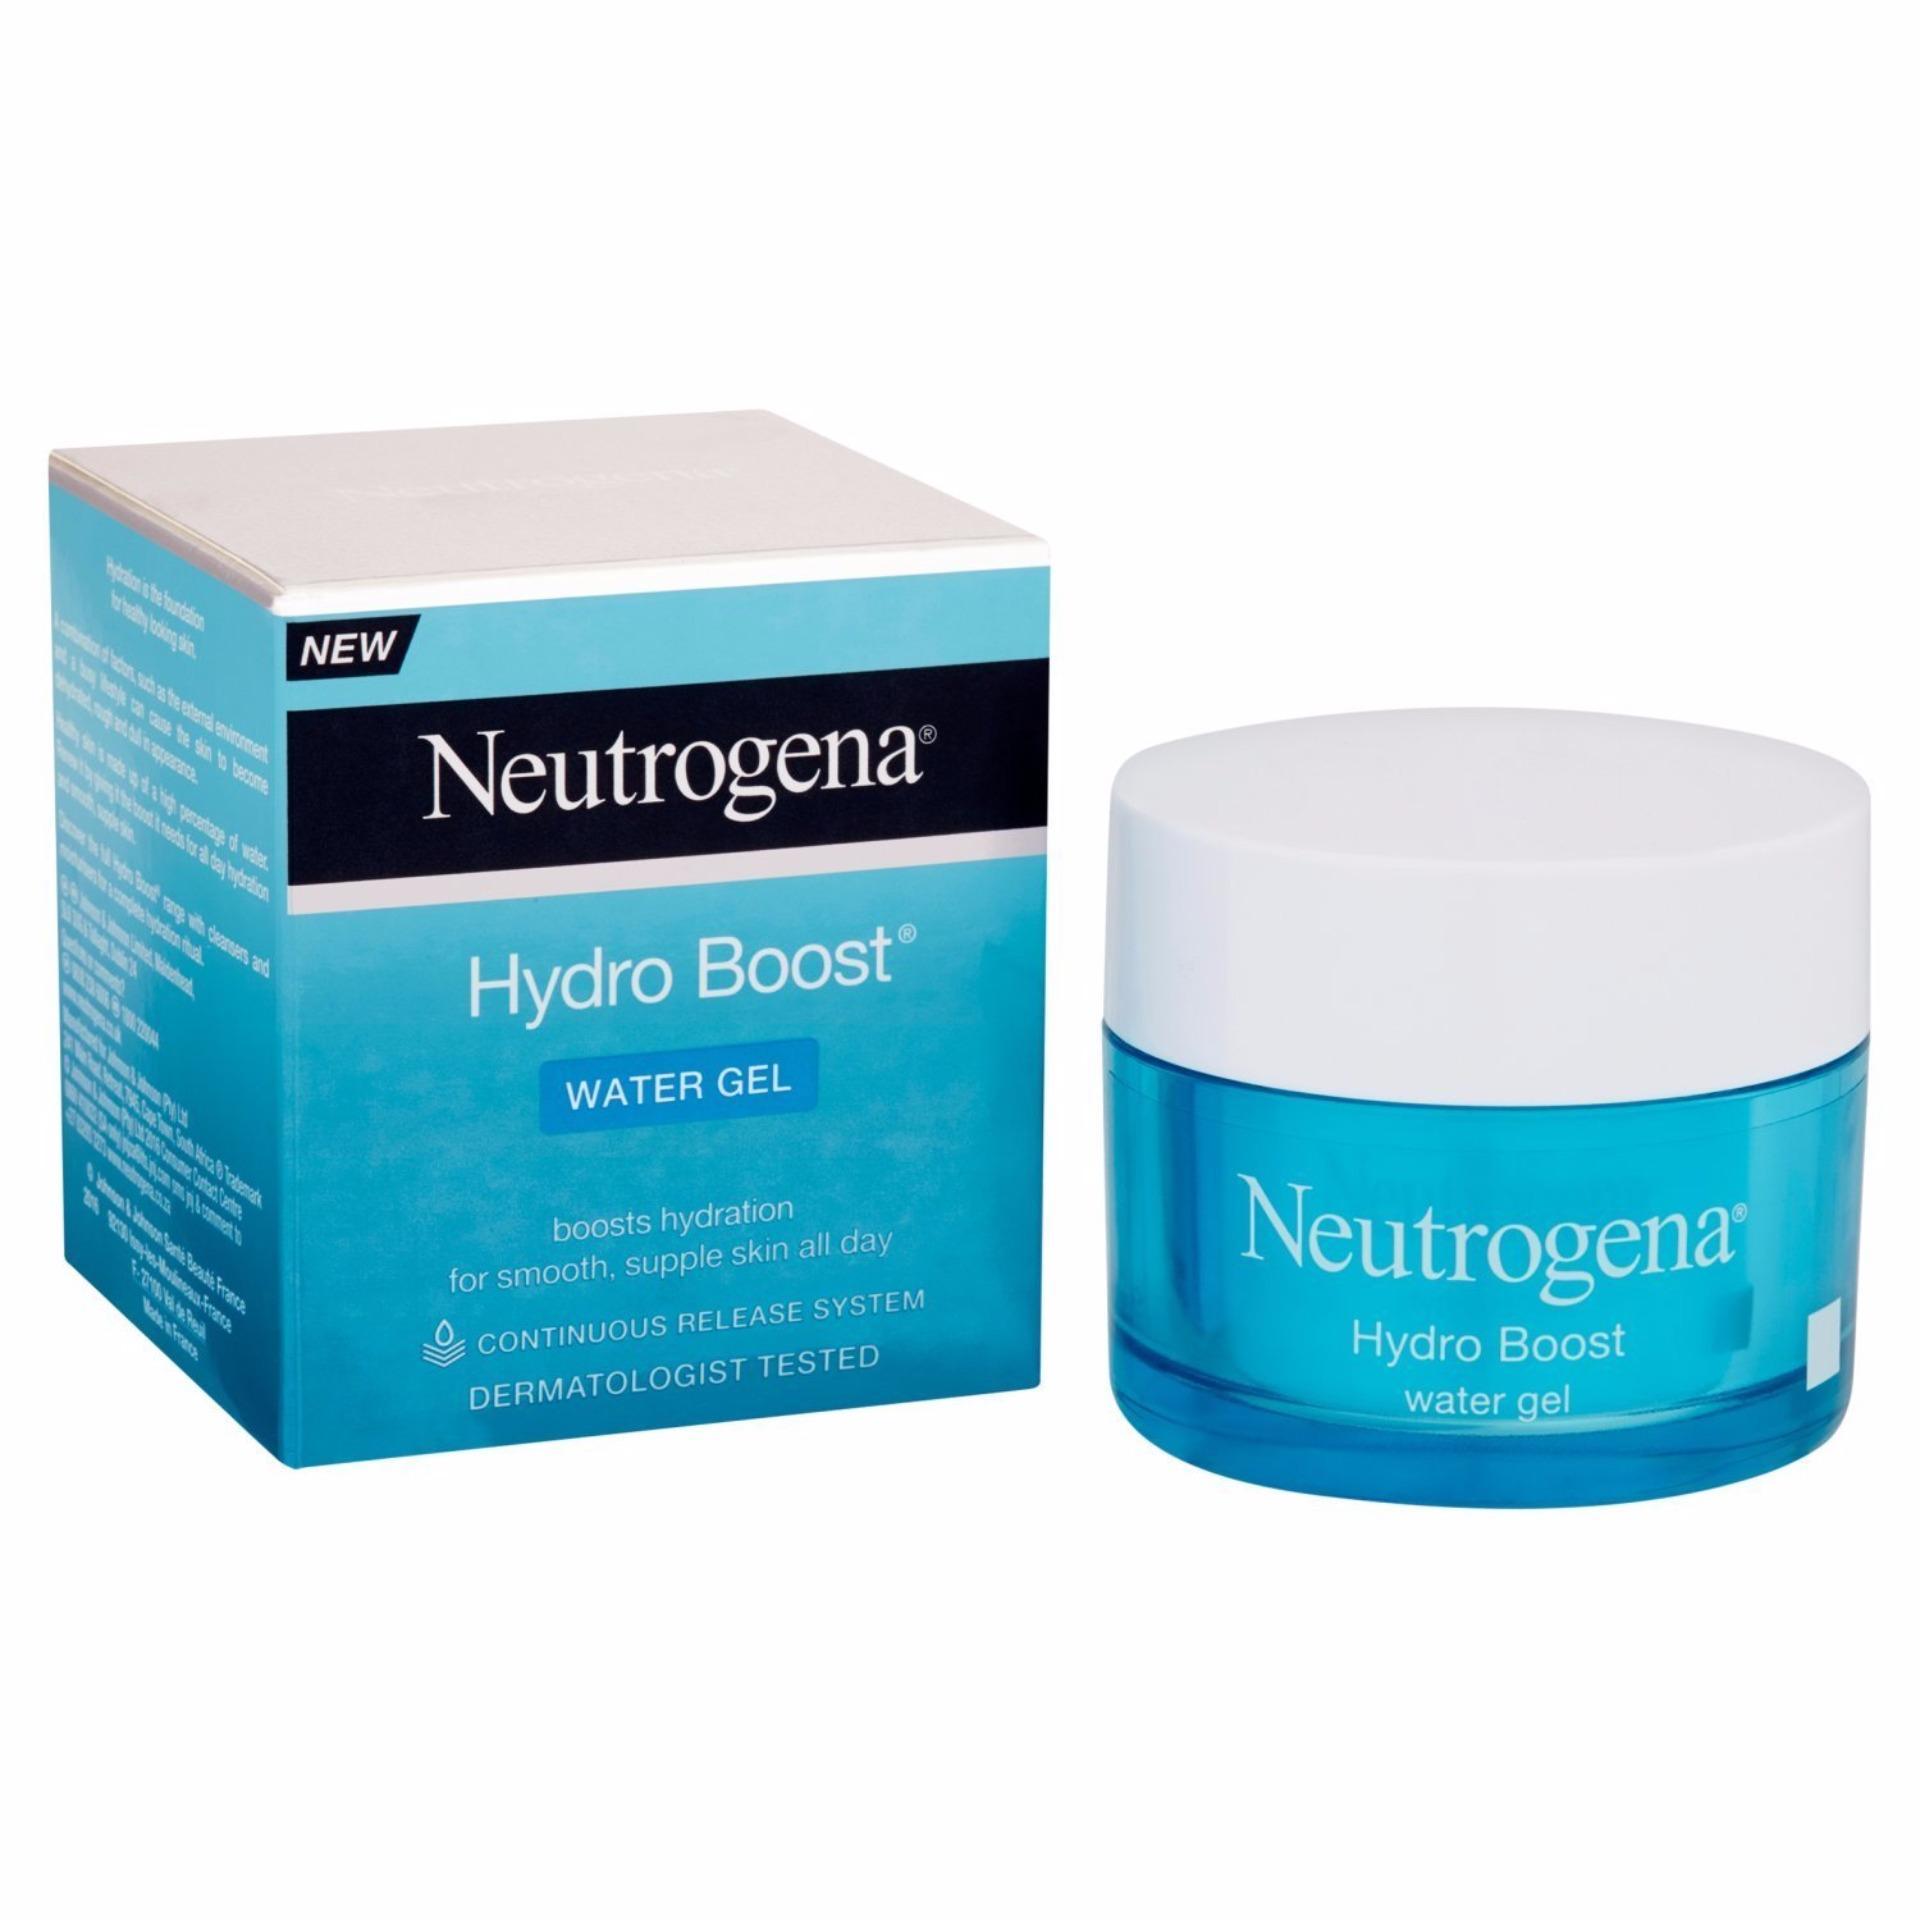 Drskin Care Cream Cr Biru Tas Daftar Harga Terlengkap Indonesia Tile Paket Hn Theraskin Neutrogena Hydro Boost Gel Dry Skin France